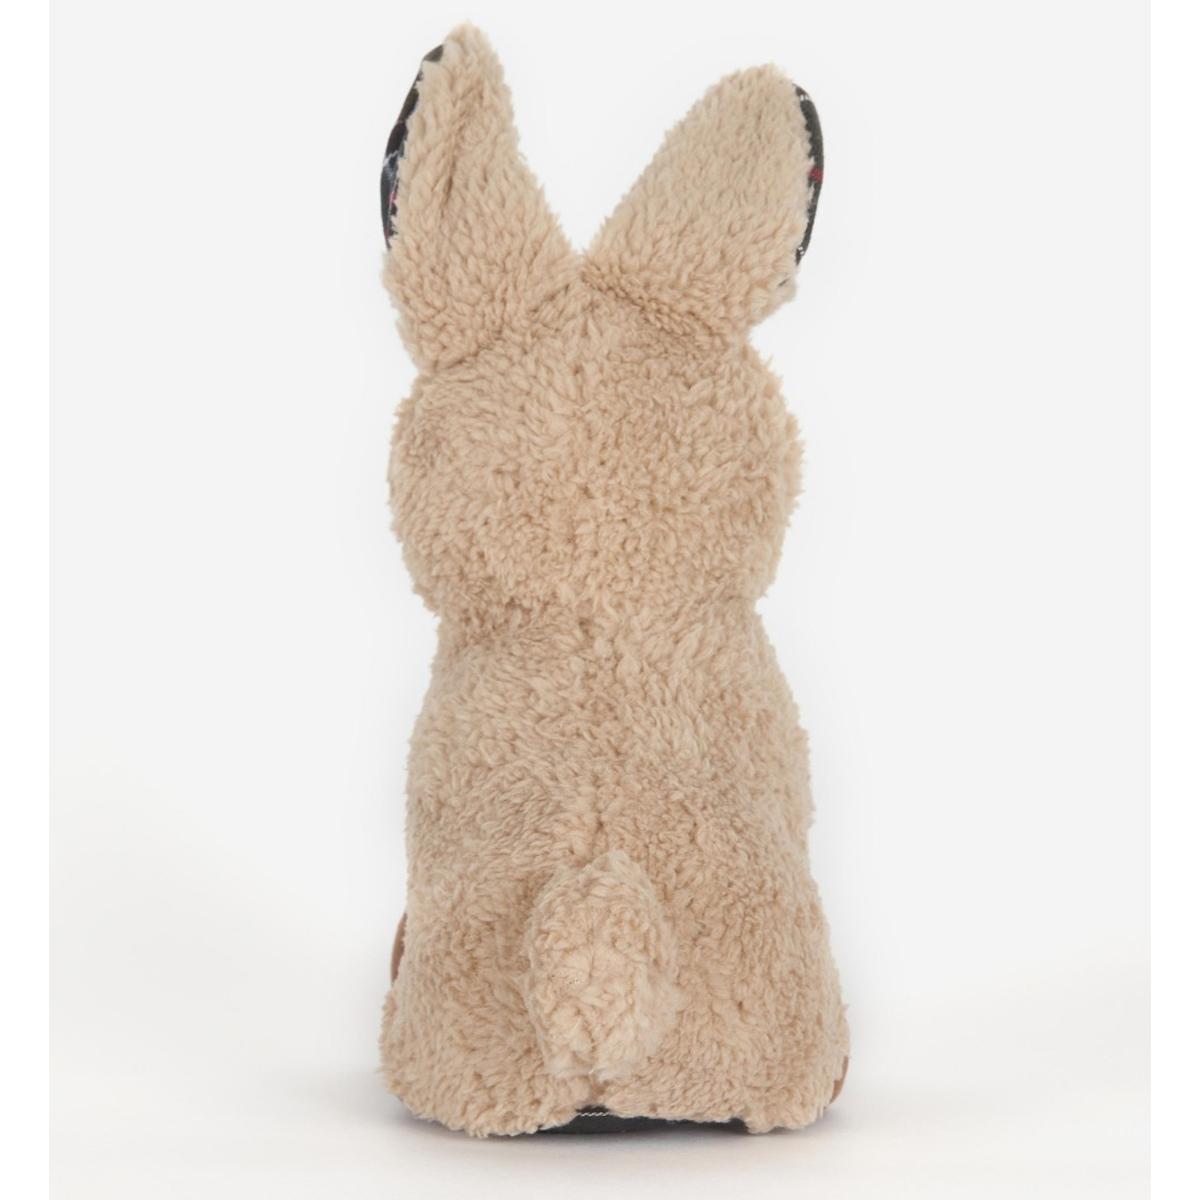 Barbour Rabbit Dog Toy